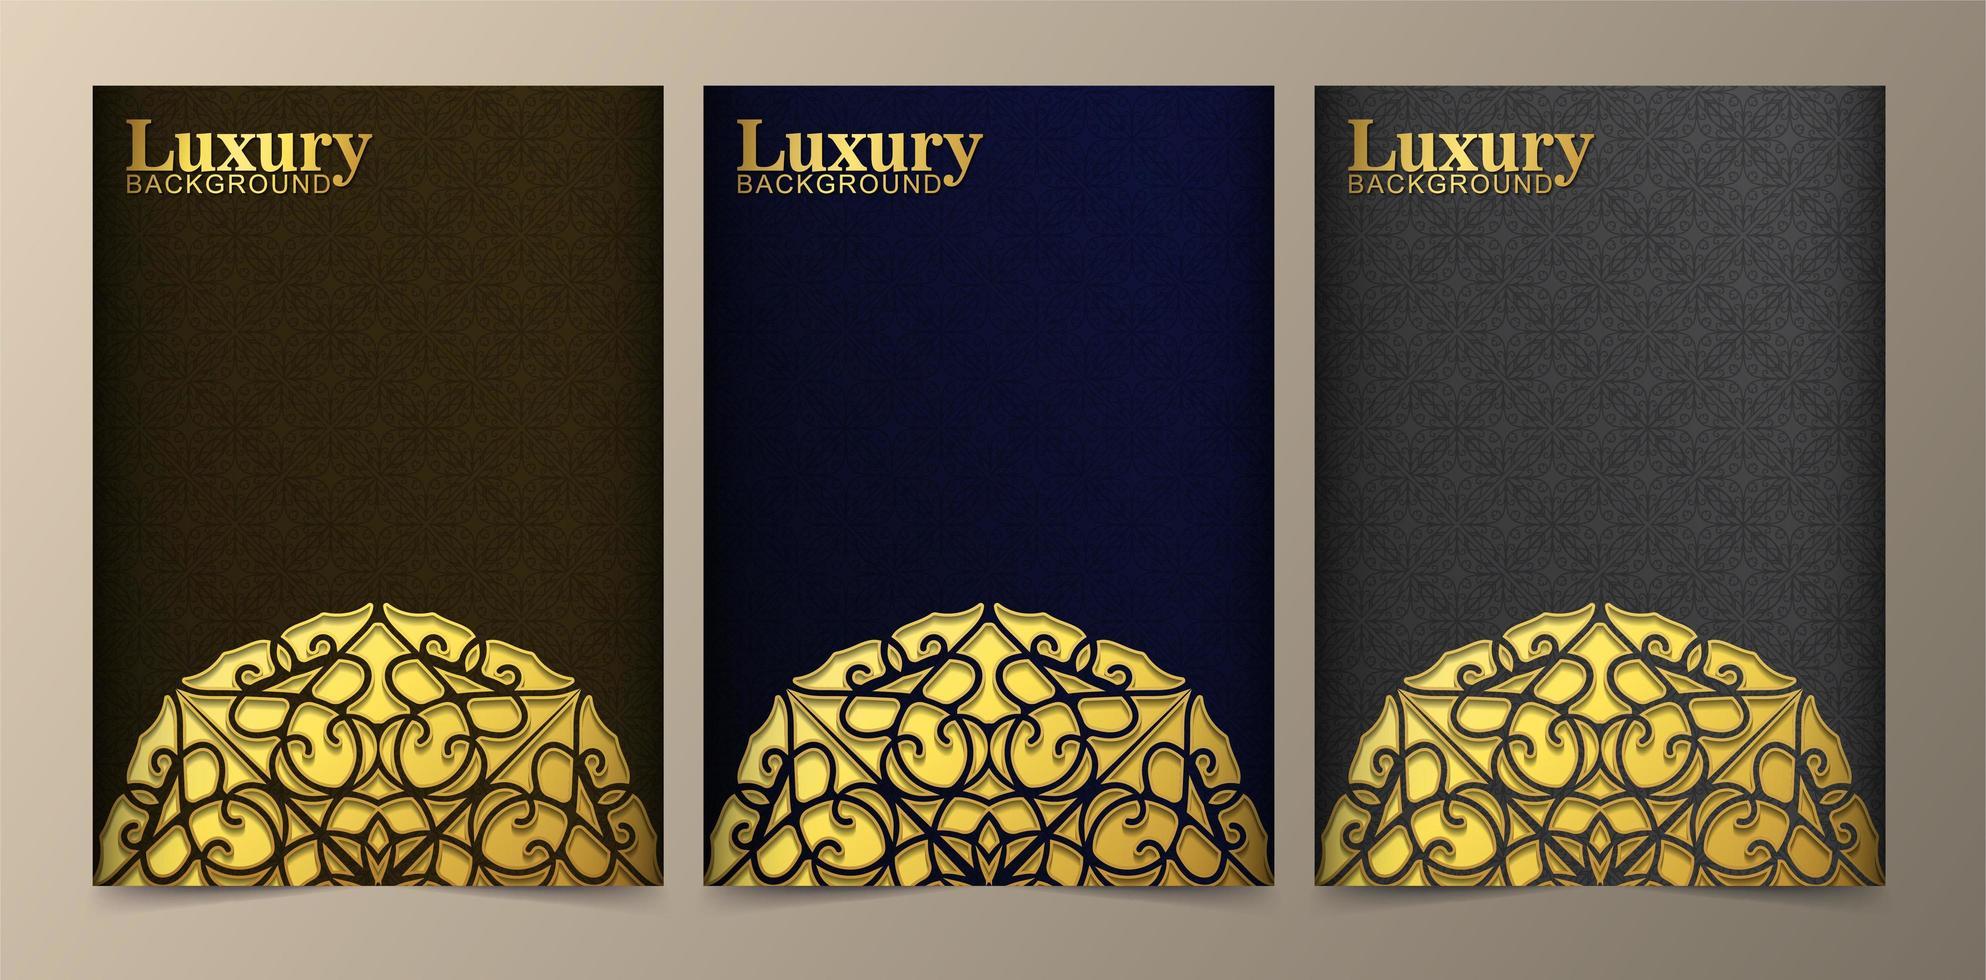 copertine di mandala dorate di lusso marrone, blu e grigio vettore